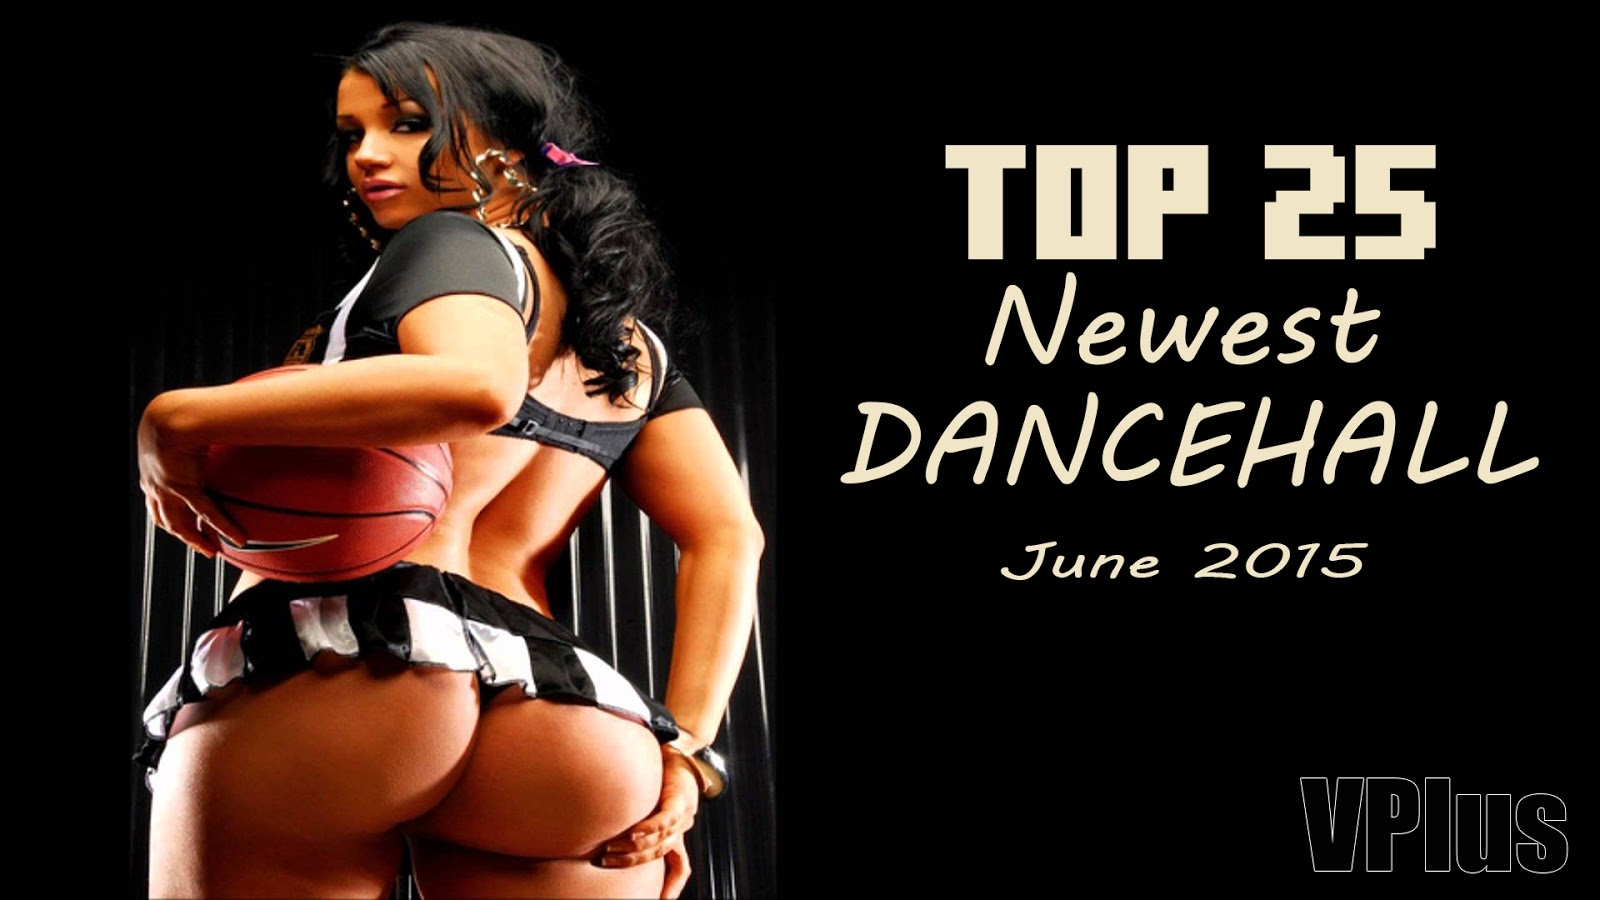 Top dancehall singles BBC - Radio 1 - Charts - UK Top 40 Dance Singles